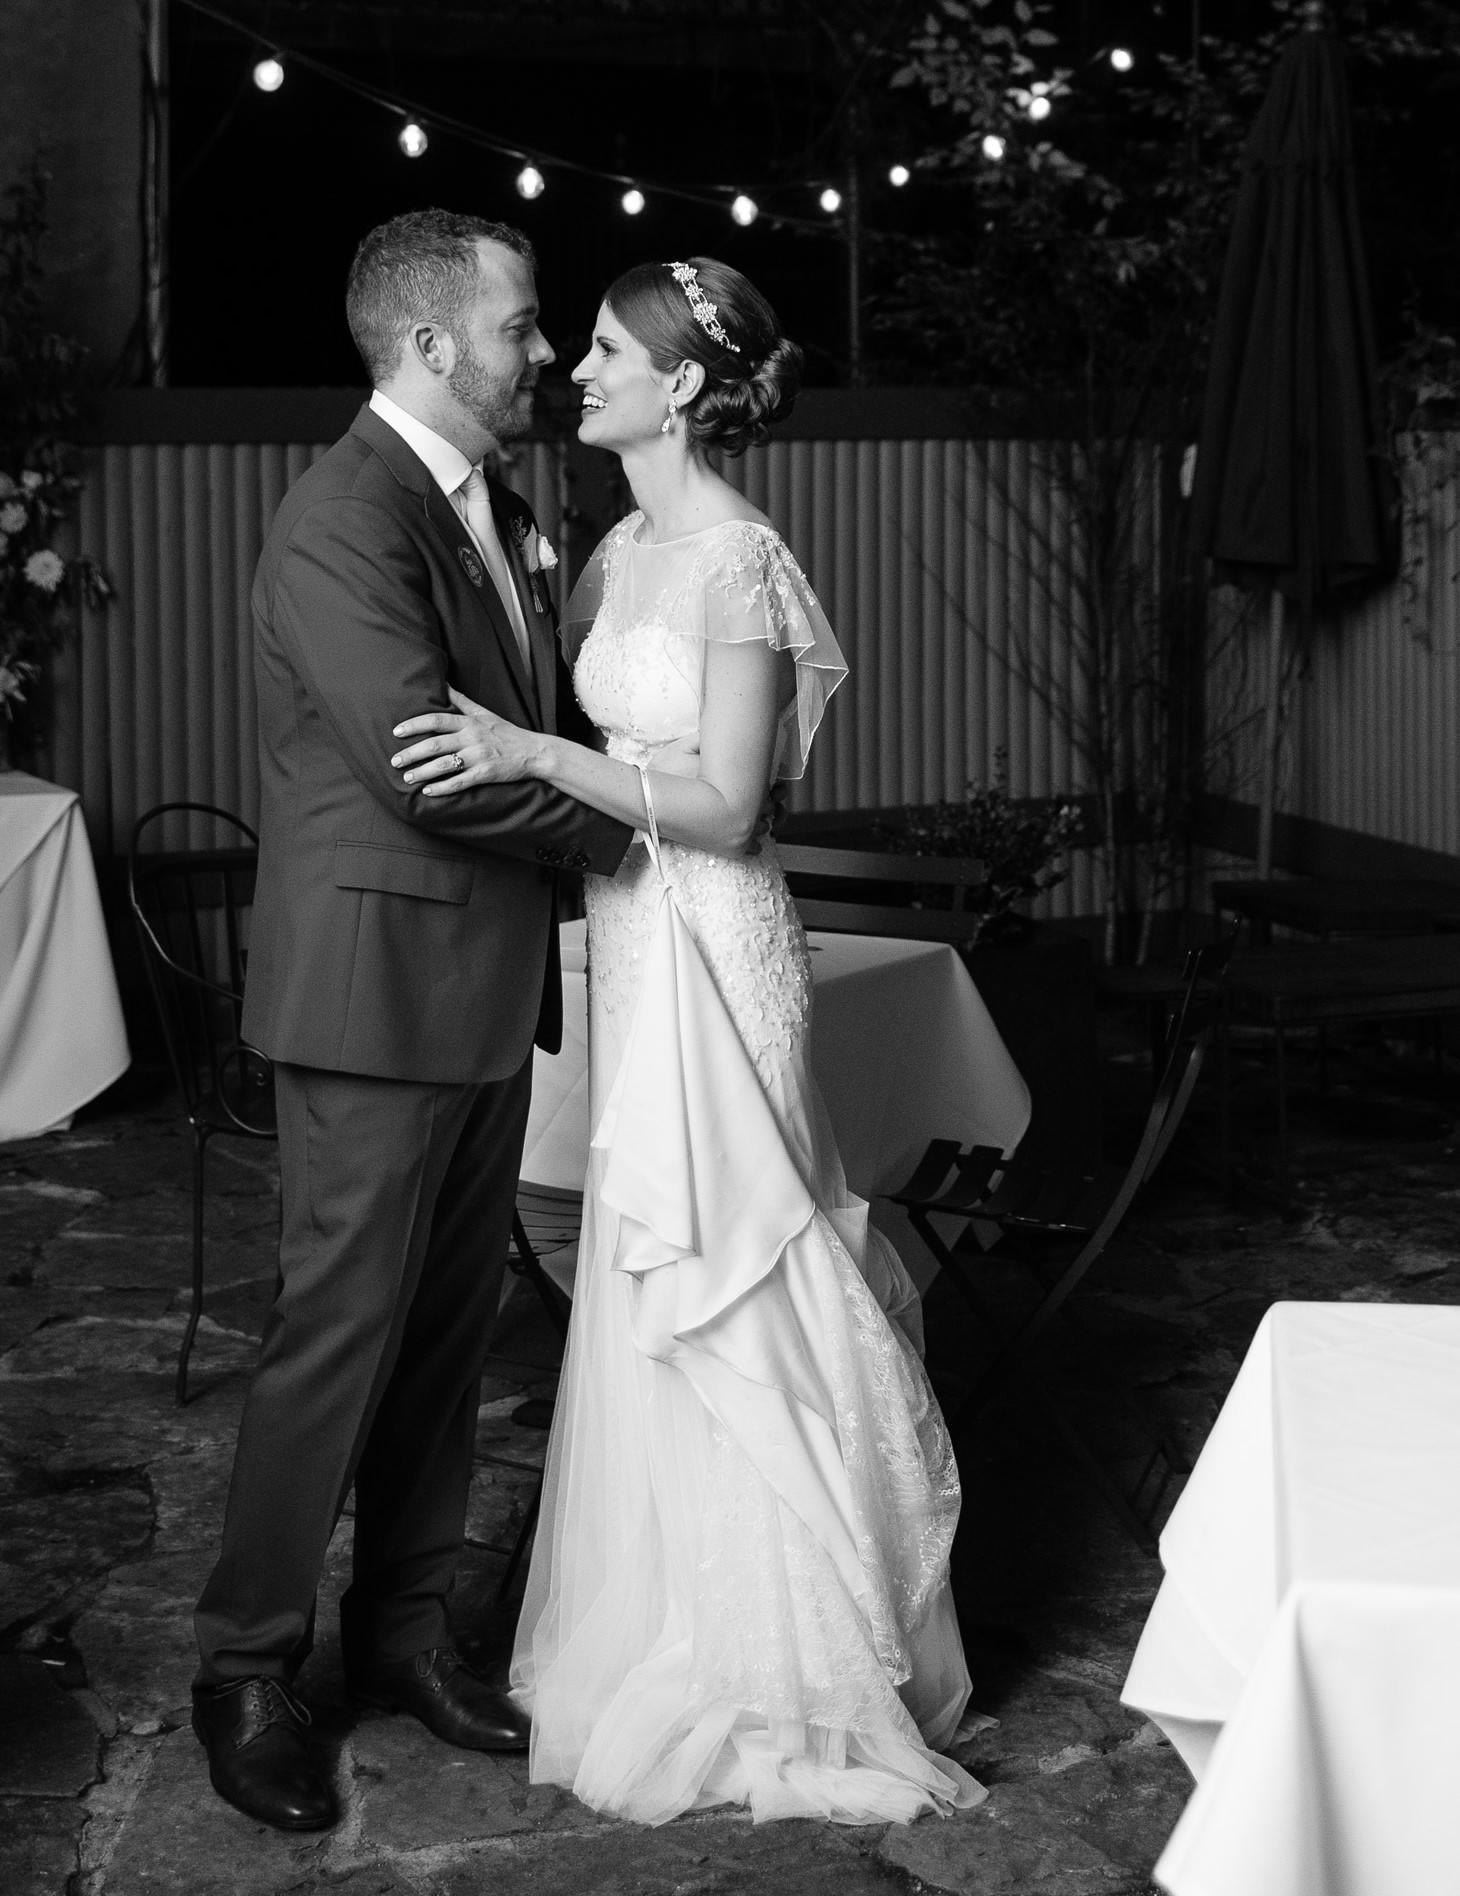 x-brooklyn-restaurant-wedding-nyc-weddingi-photographer-smitten-chickens208.jpg